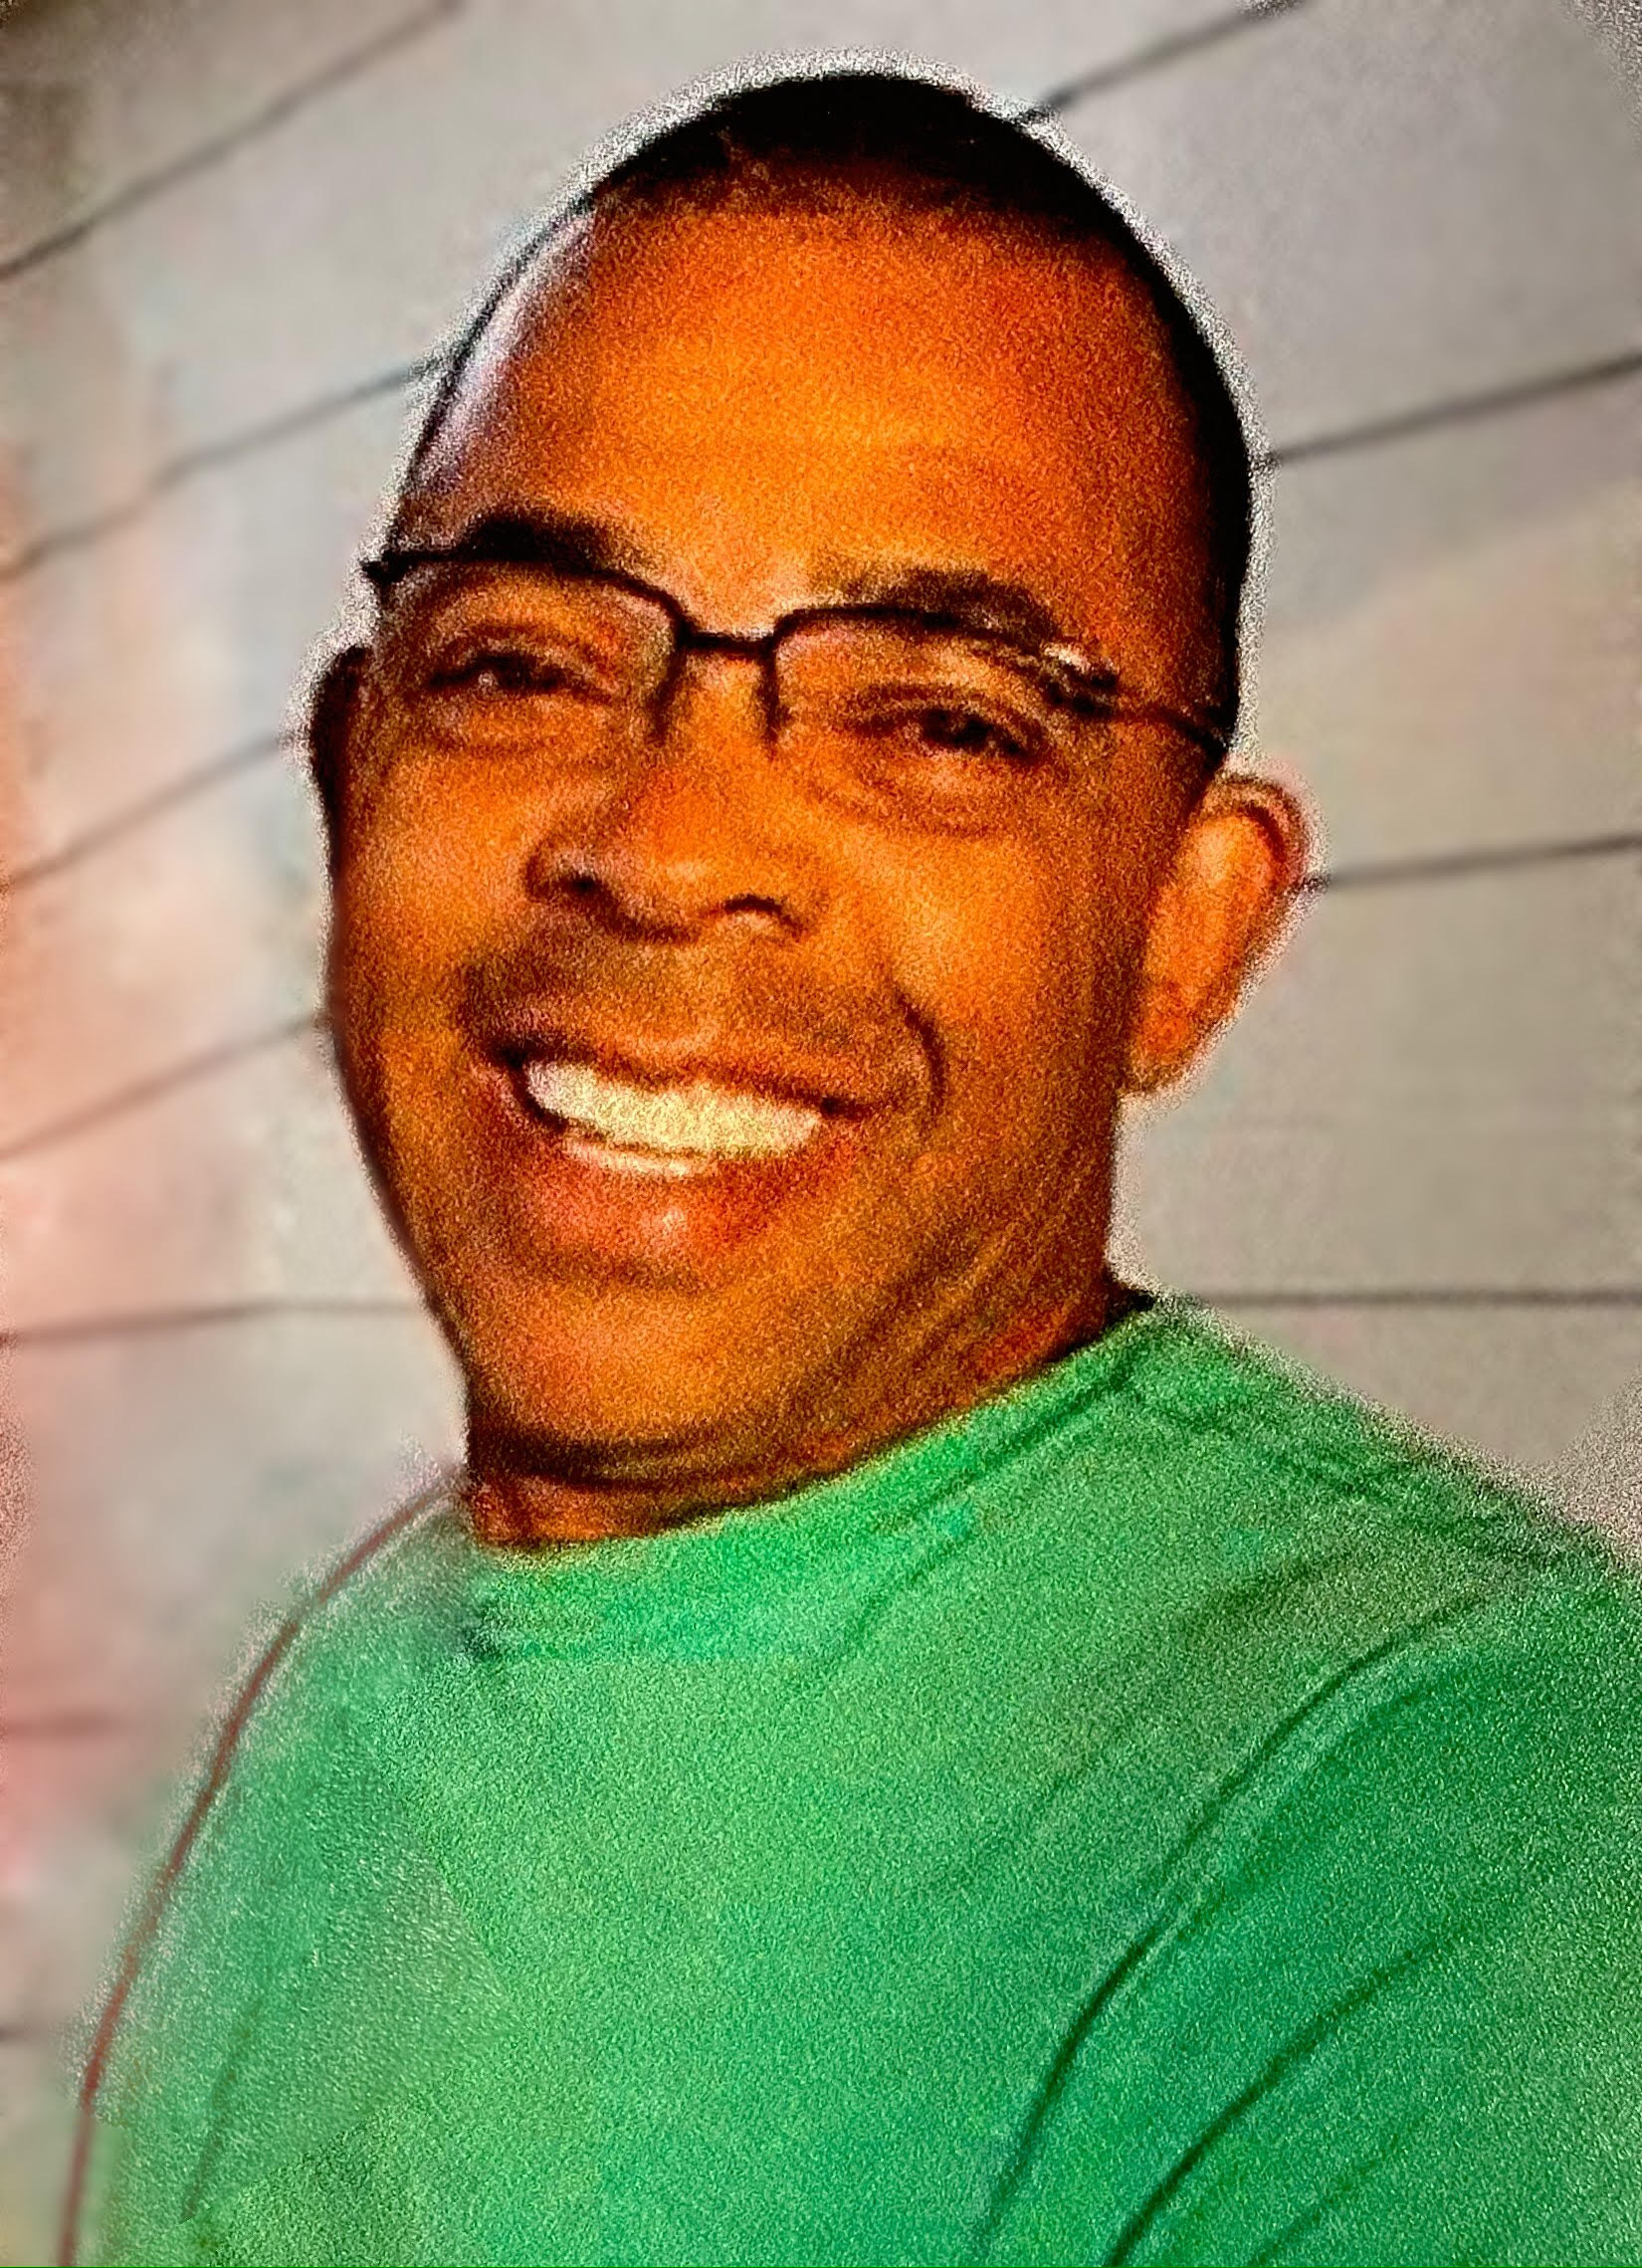 Leroy Jerome Bess